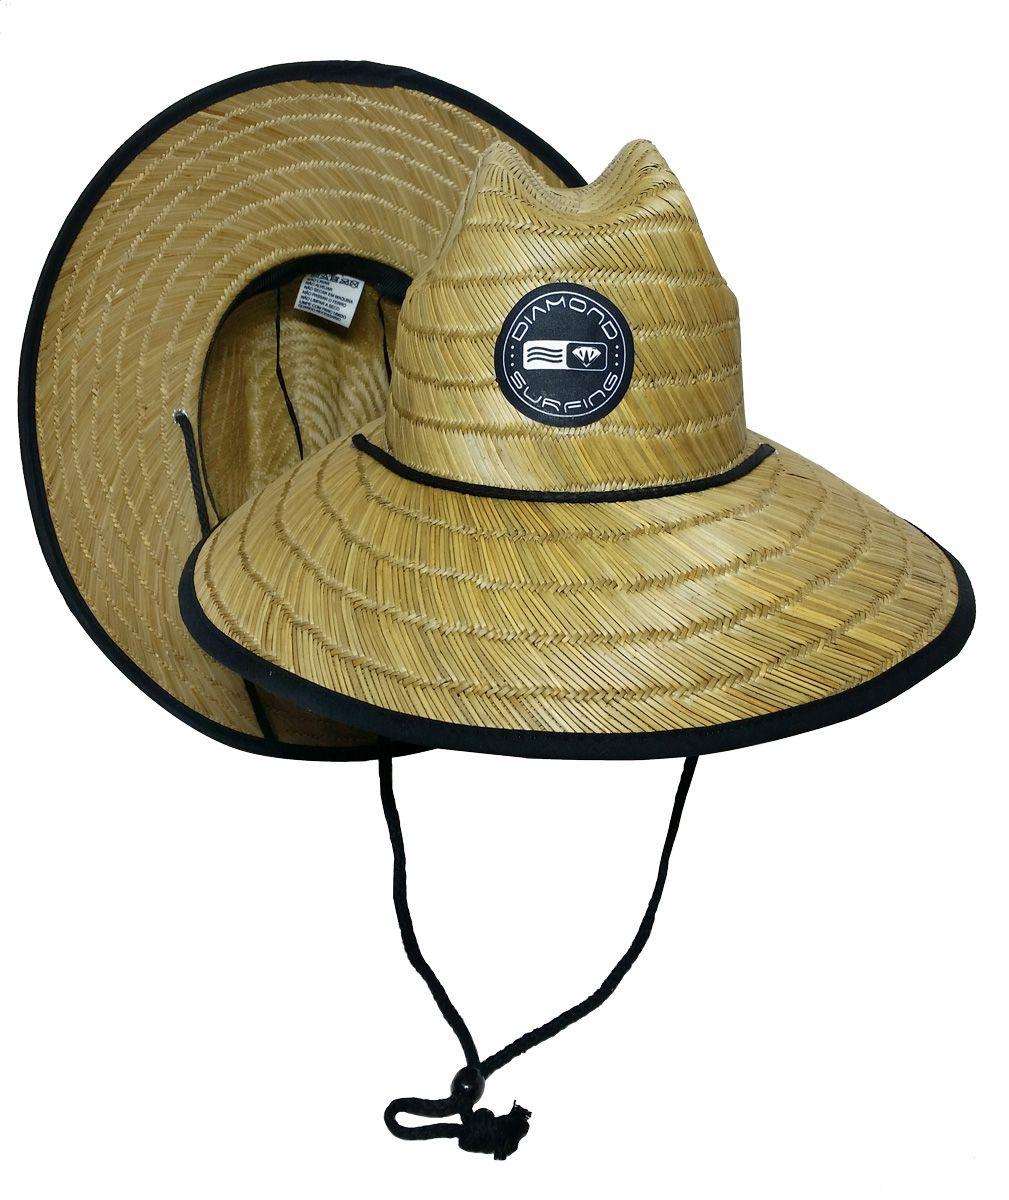 Chapéu de Palha Diamond Surfing - Black